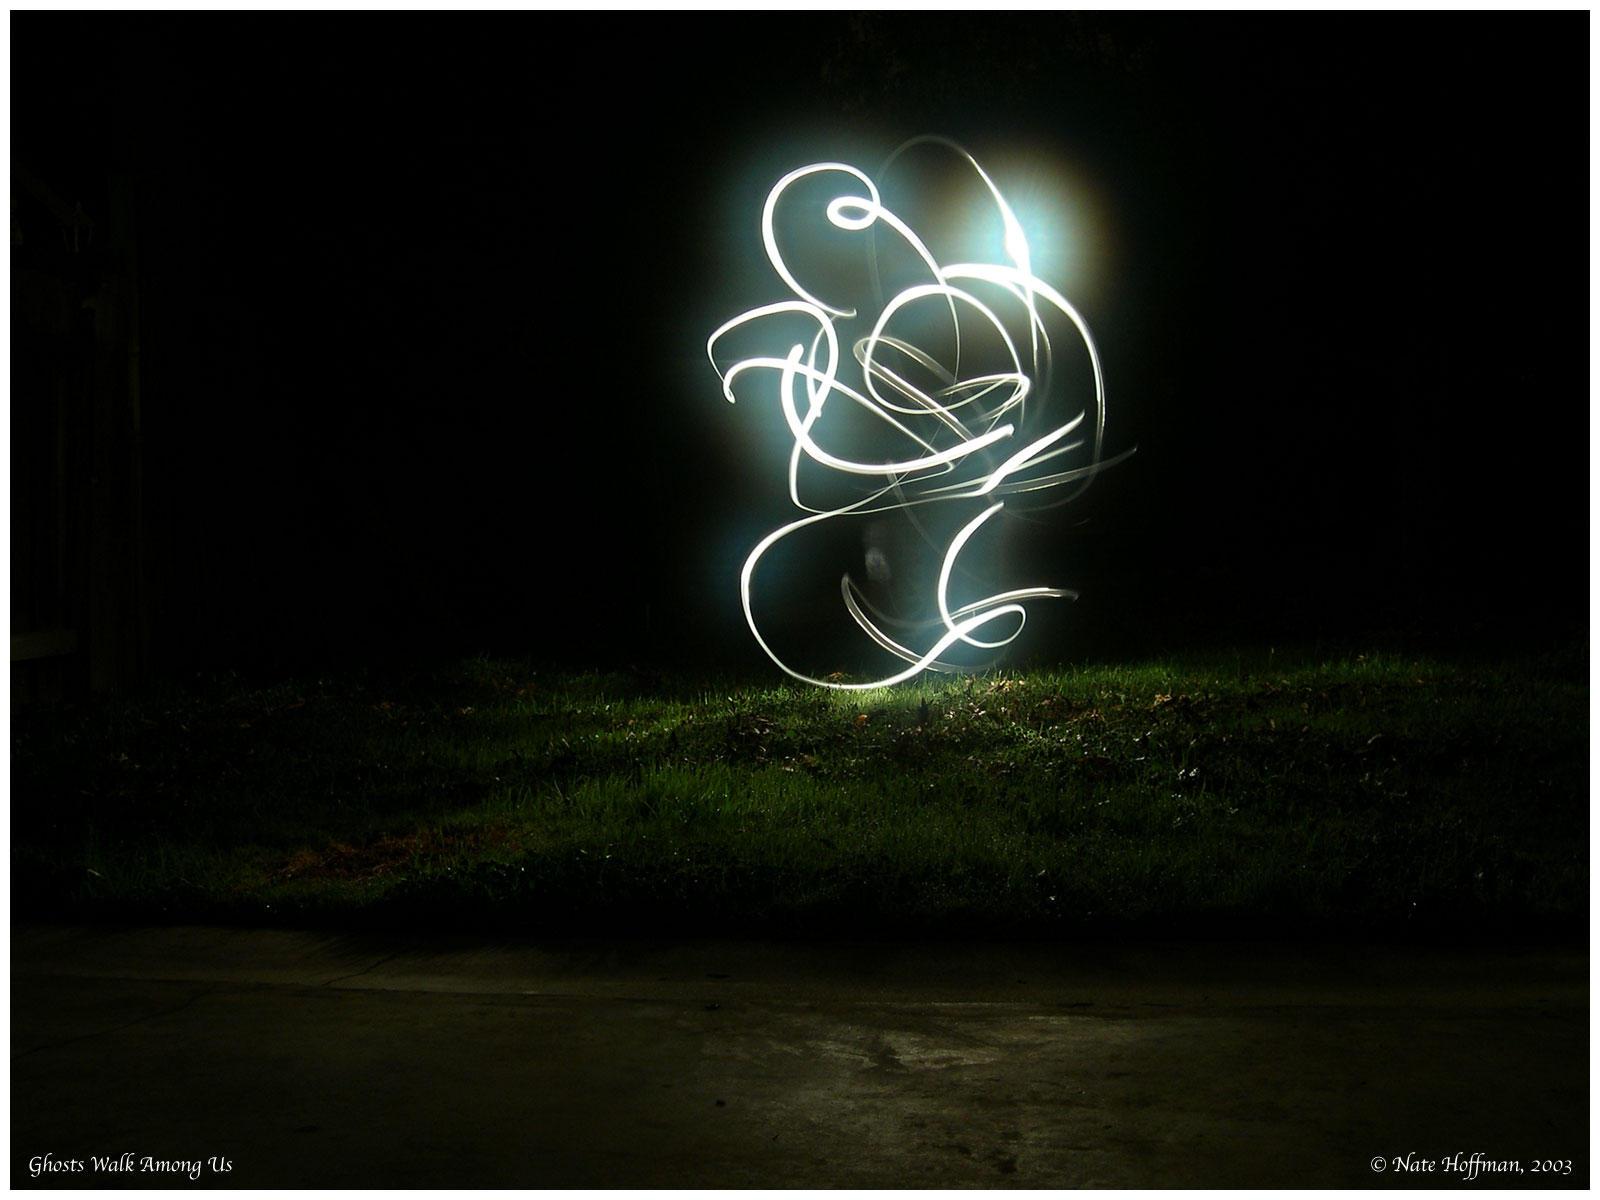 Ghosts Walk Among Us by strangledbyart